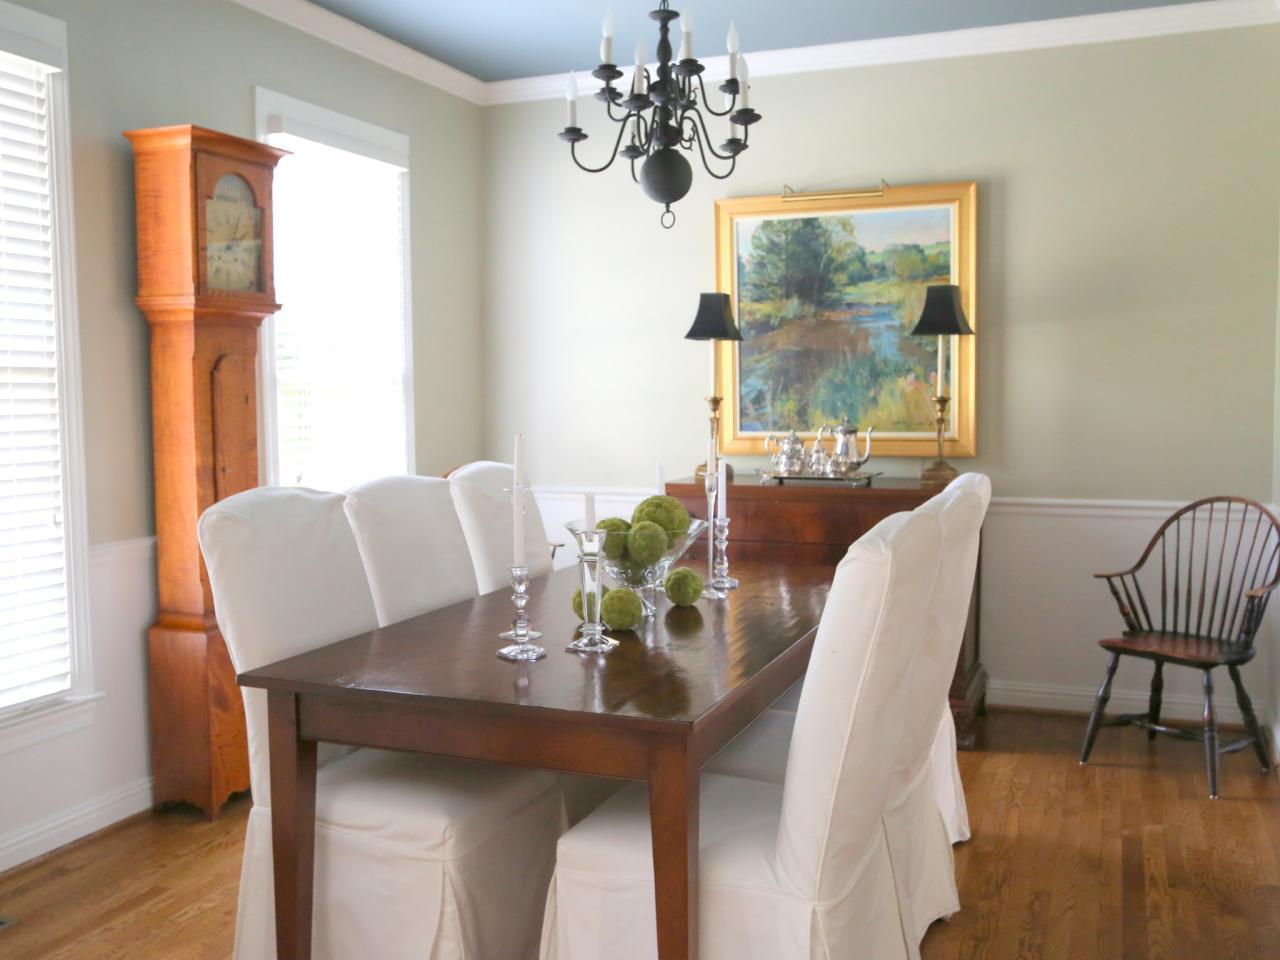 Dining room designed for art kristie barnett hgtv gallery inspired dining room dzzzfo